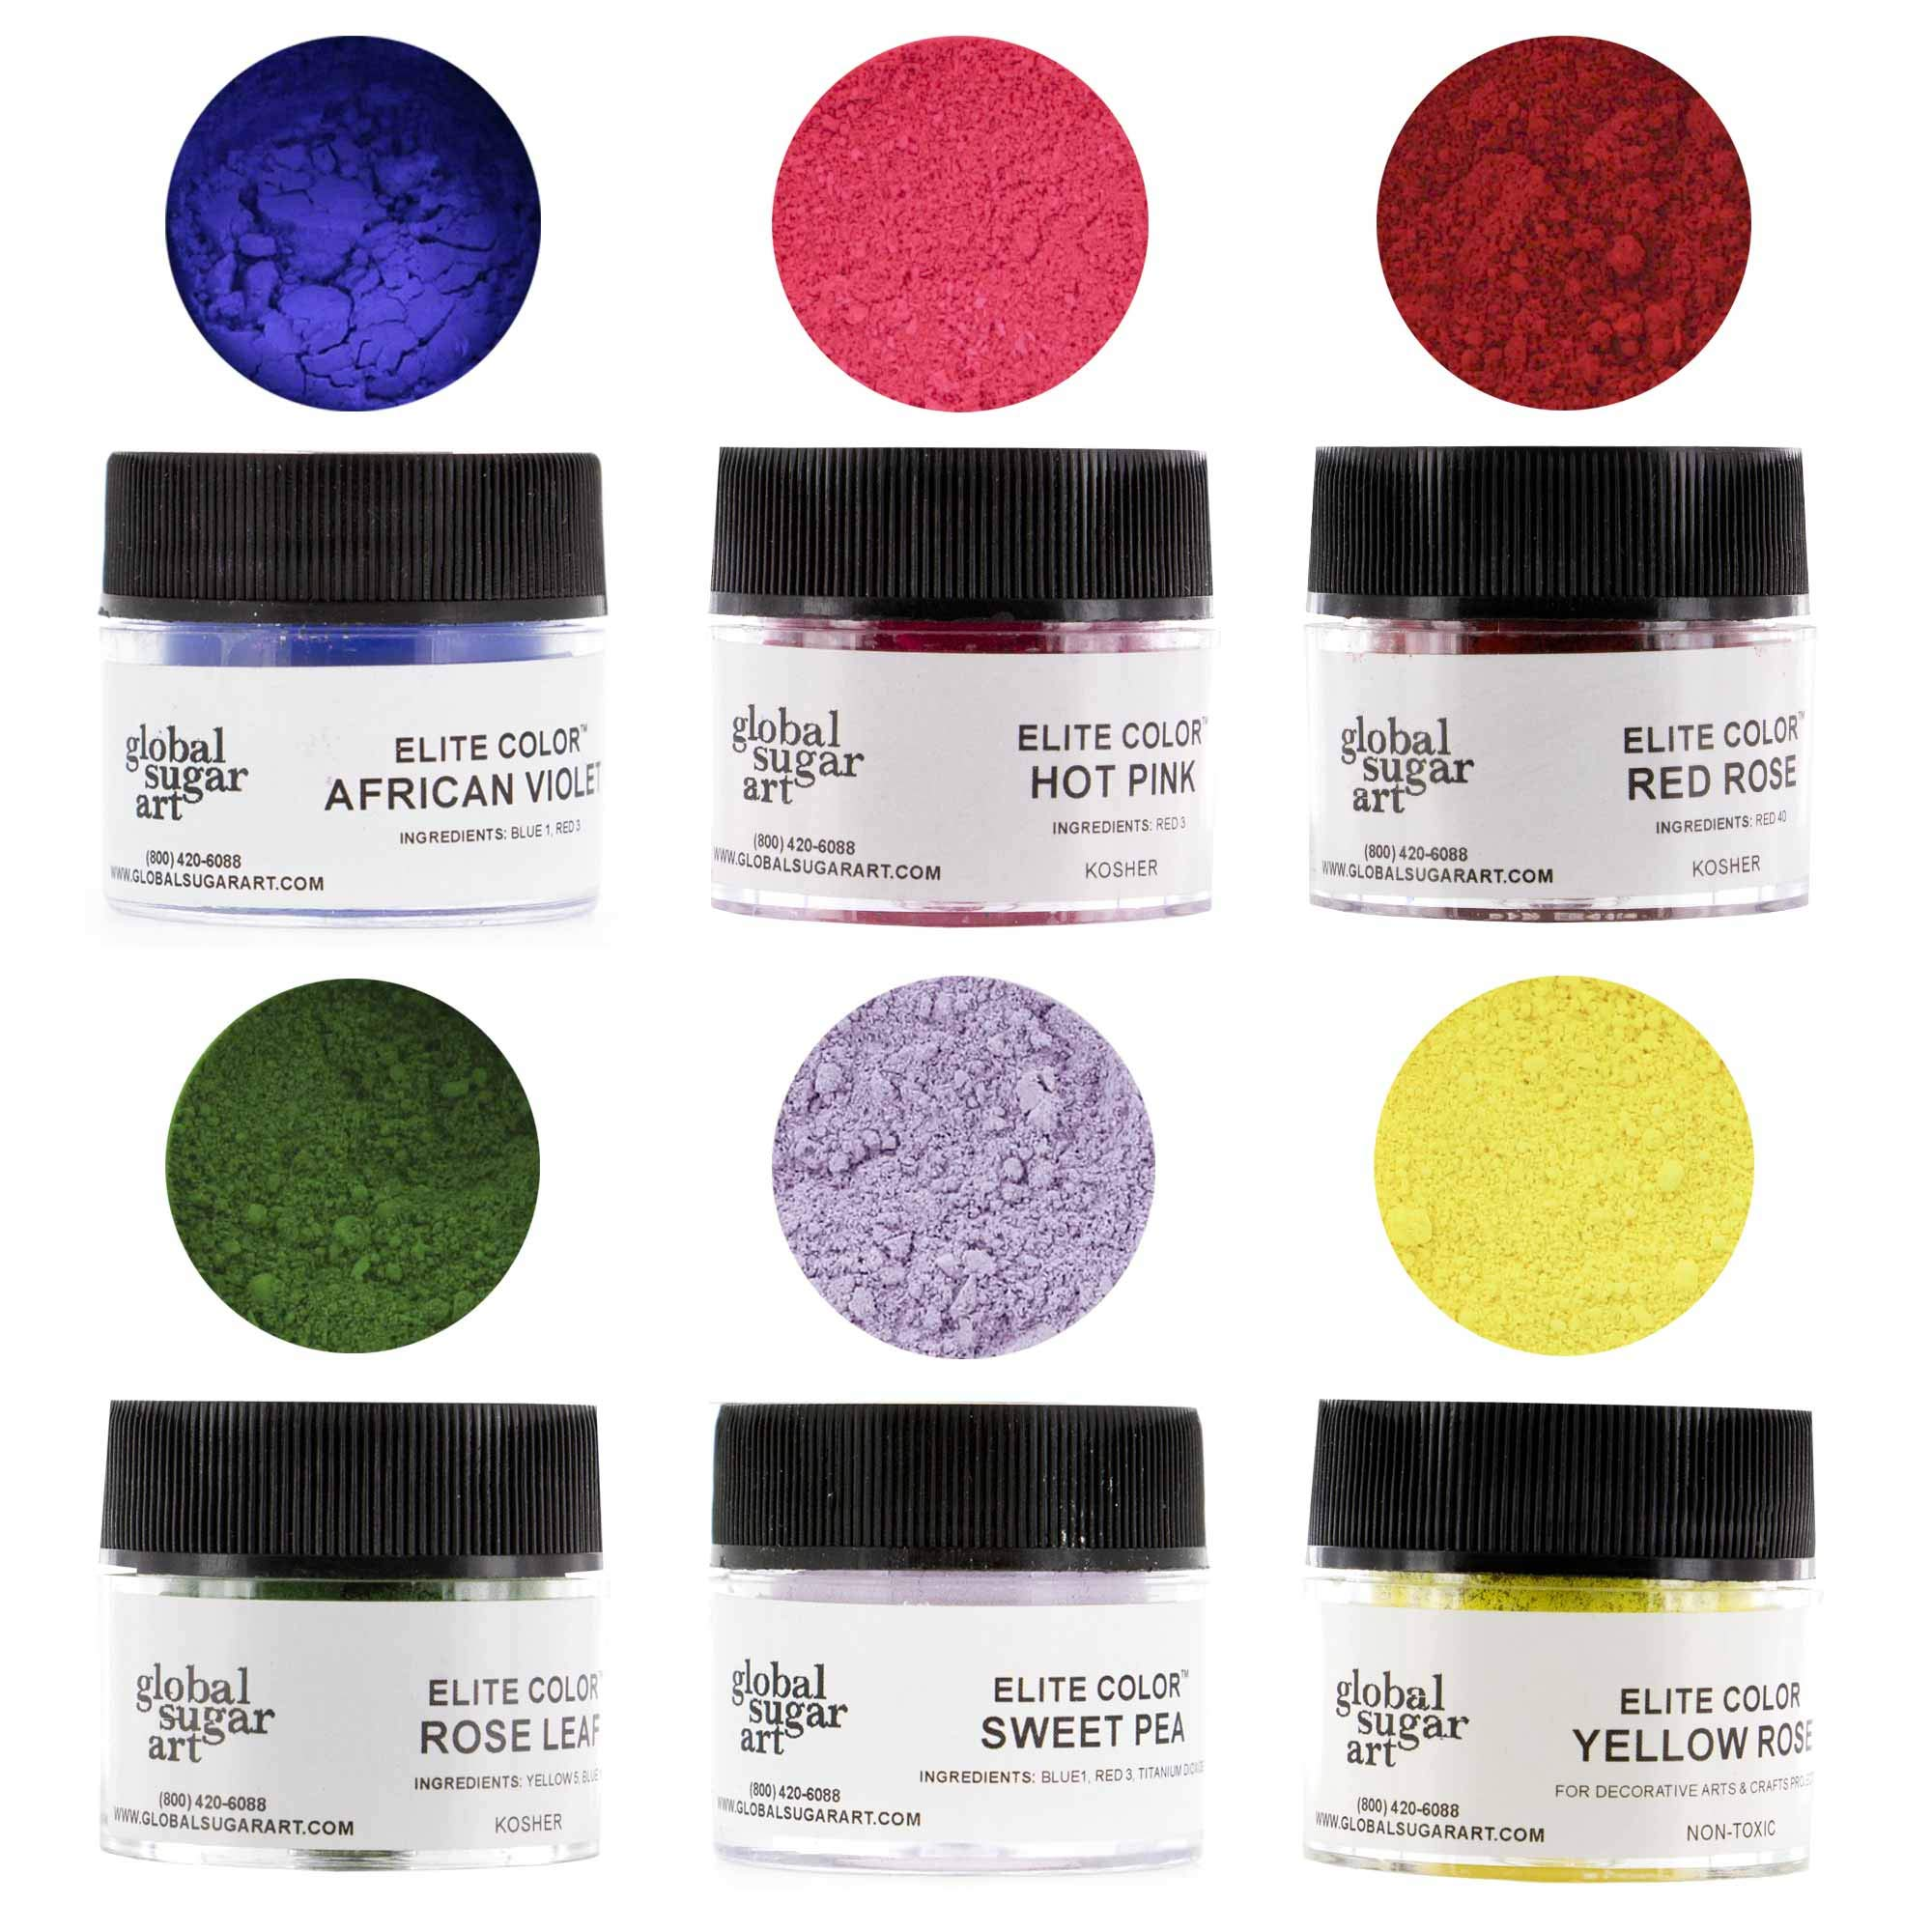 Floral Premium Petal Dust Kit, 6 Color by Global Sugar Art